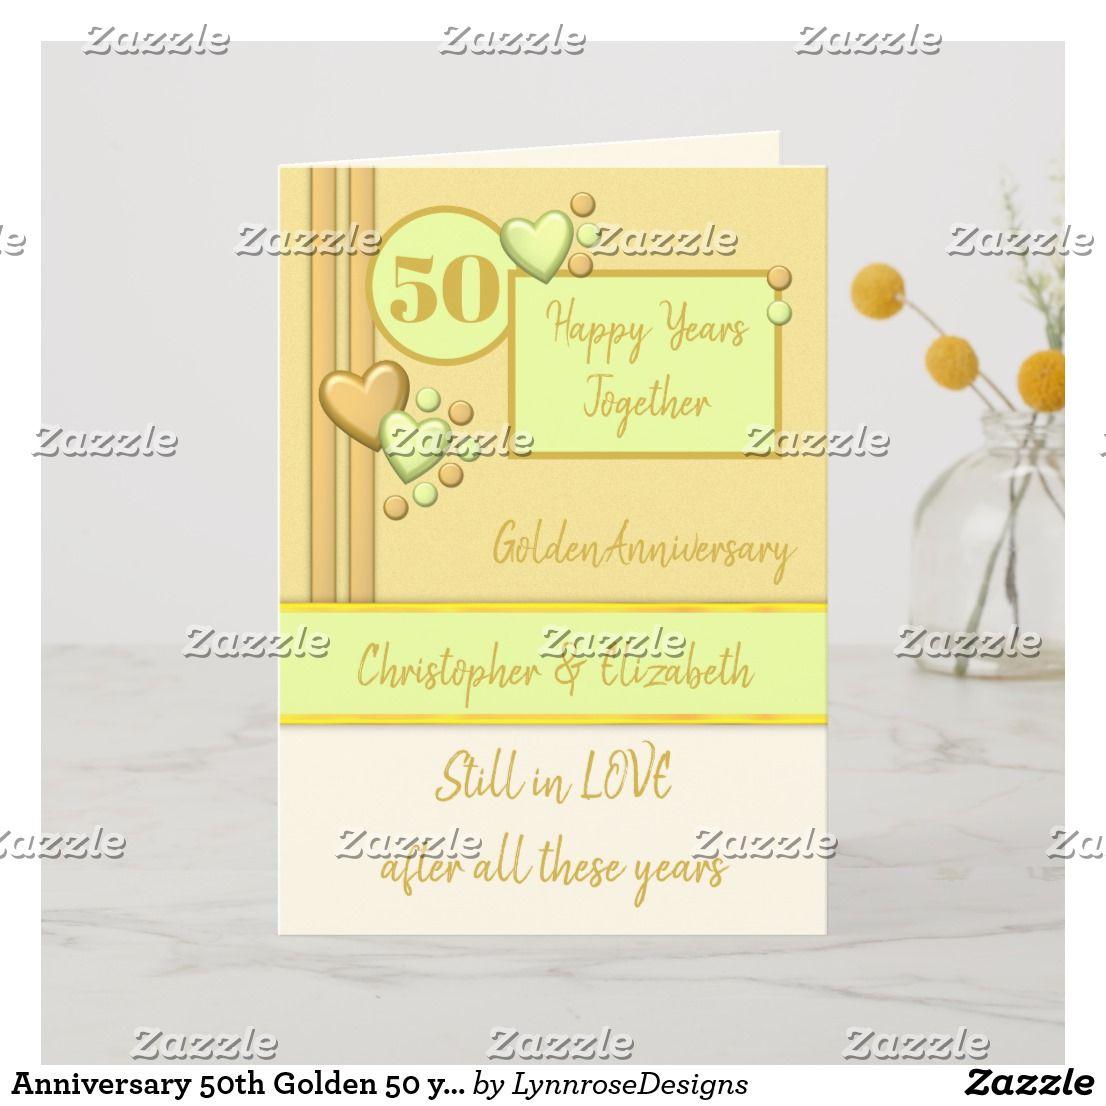 Anniversary 50th Golden 50 years green cream Card Zazzle